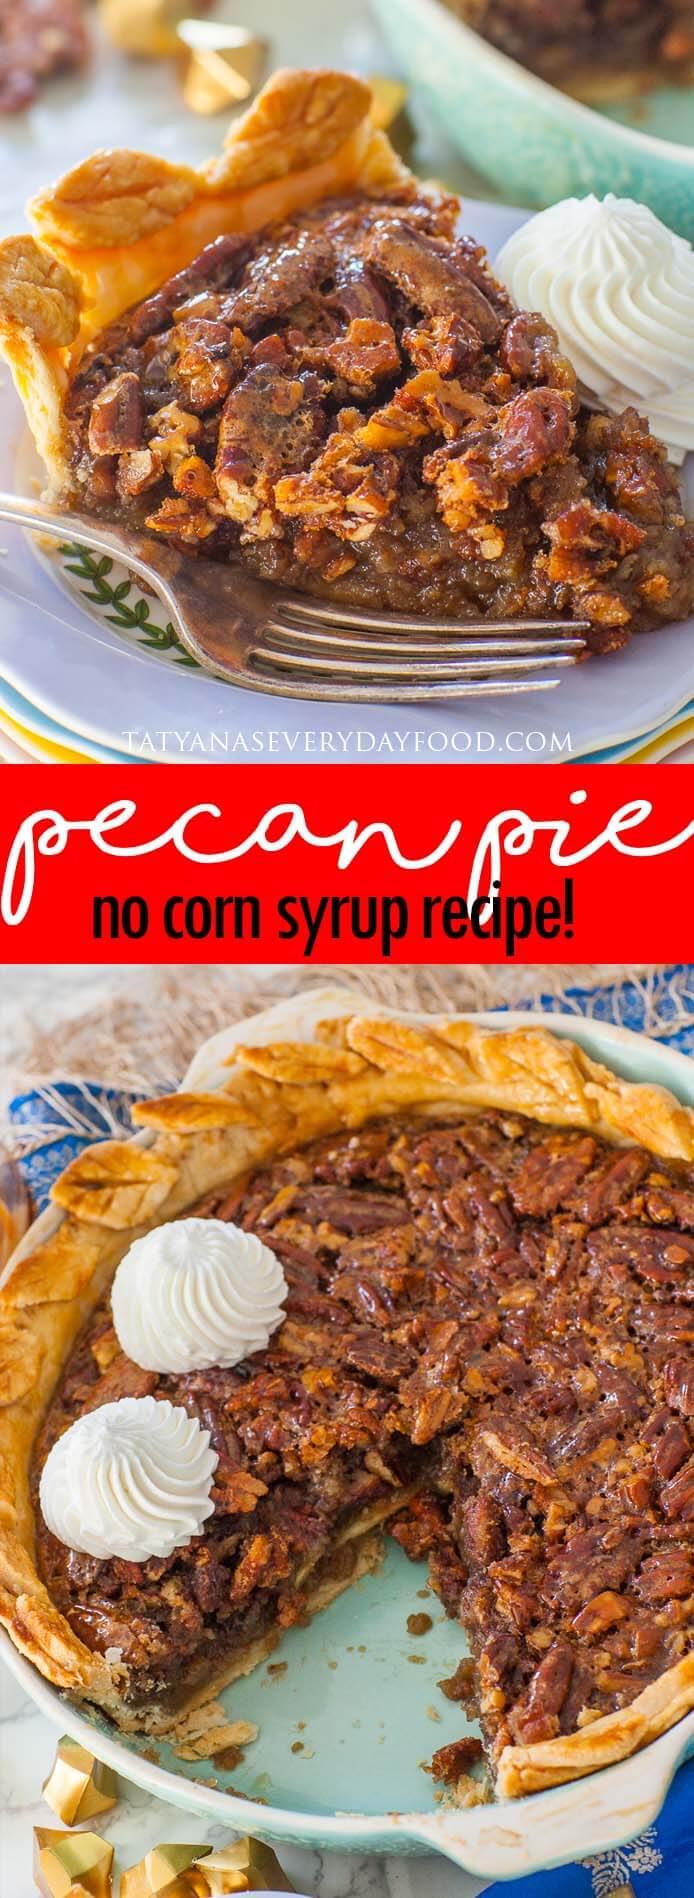 Classic Pecan Pie video recipe - no corn syrup!